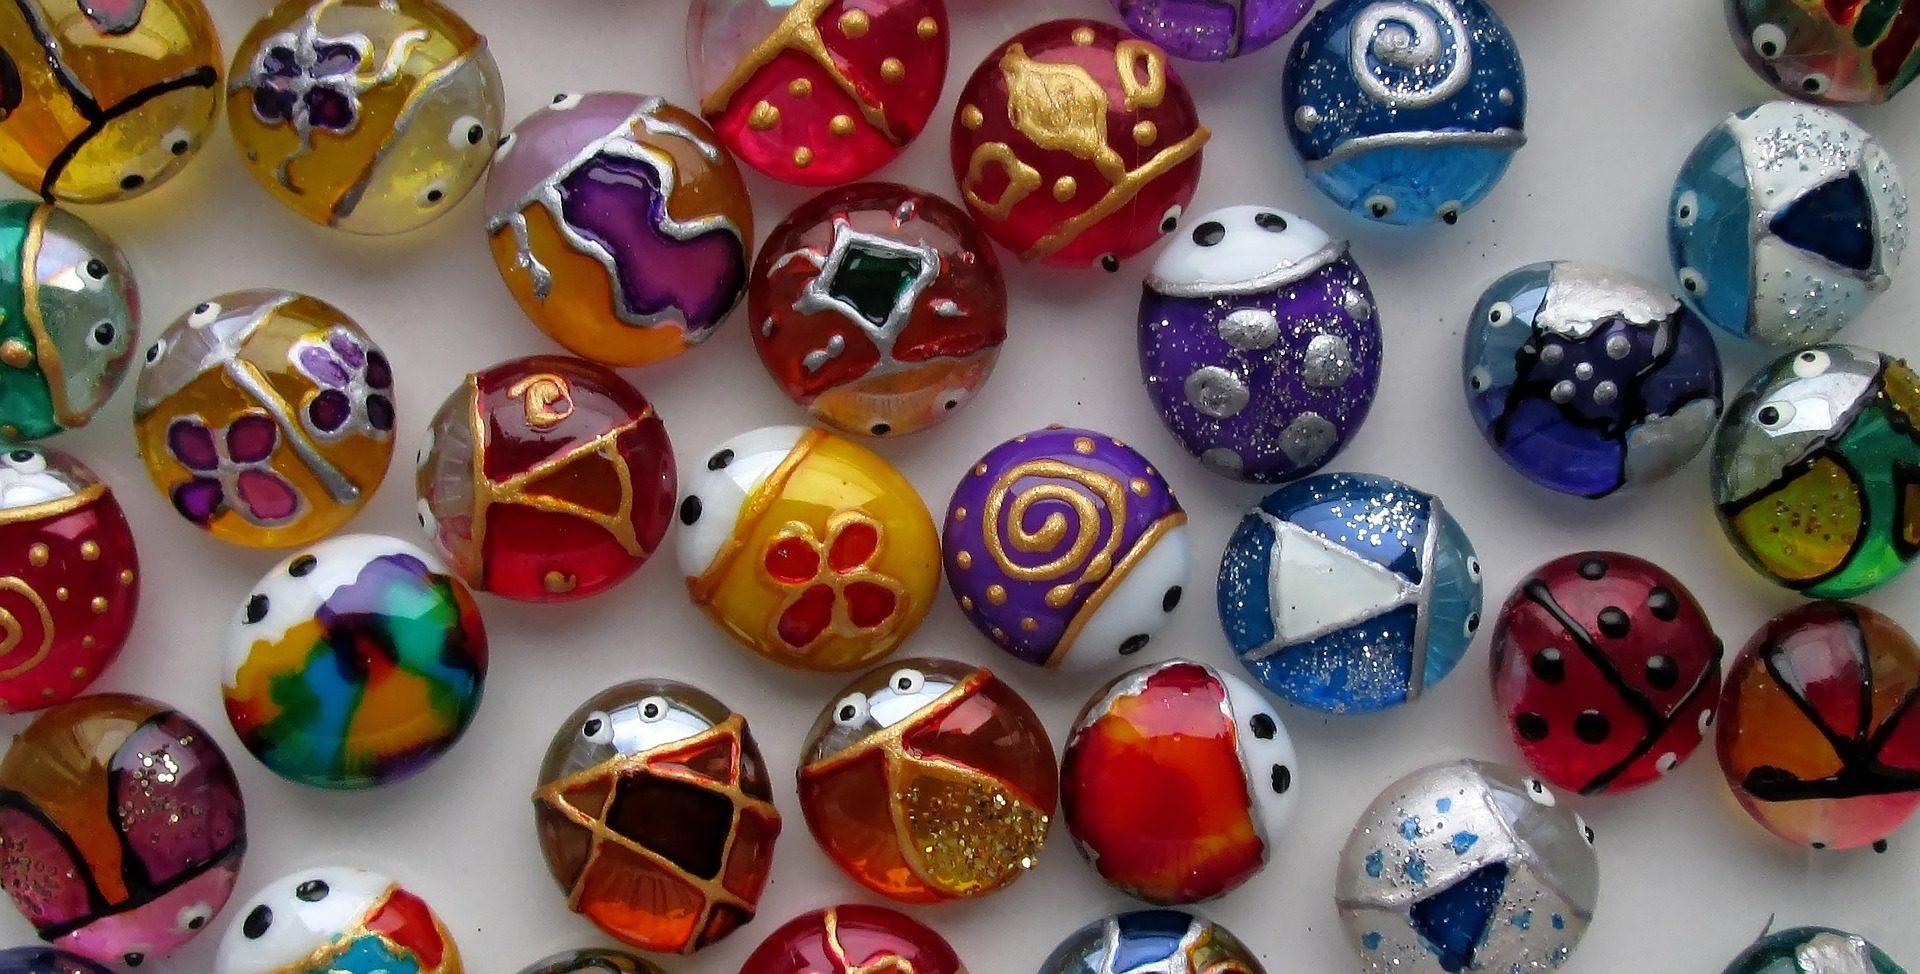 artesanato, Joaninhas, Cristal, vidro, besouros, pintura - Papéis de parede HD - Professor-falken.com